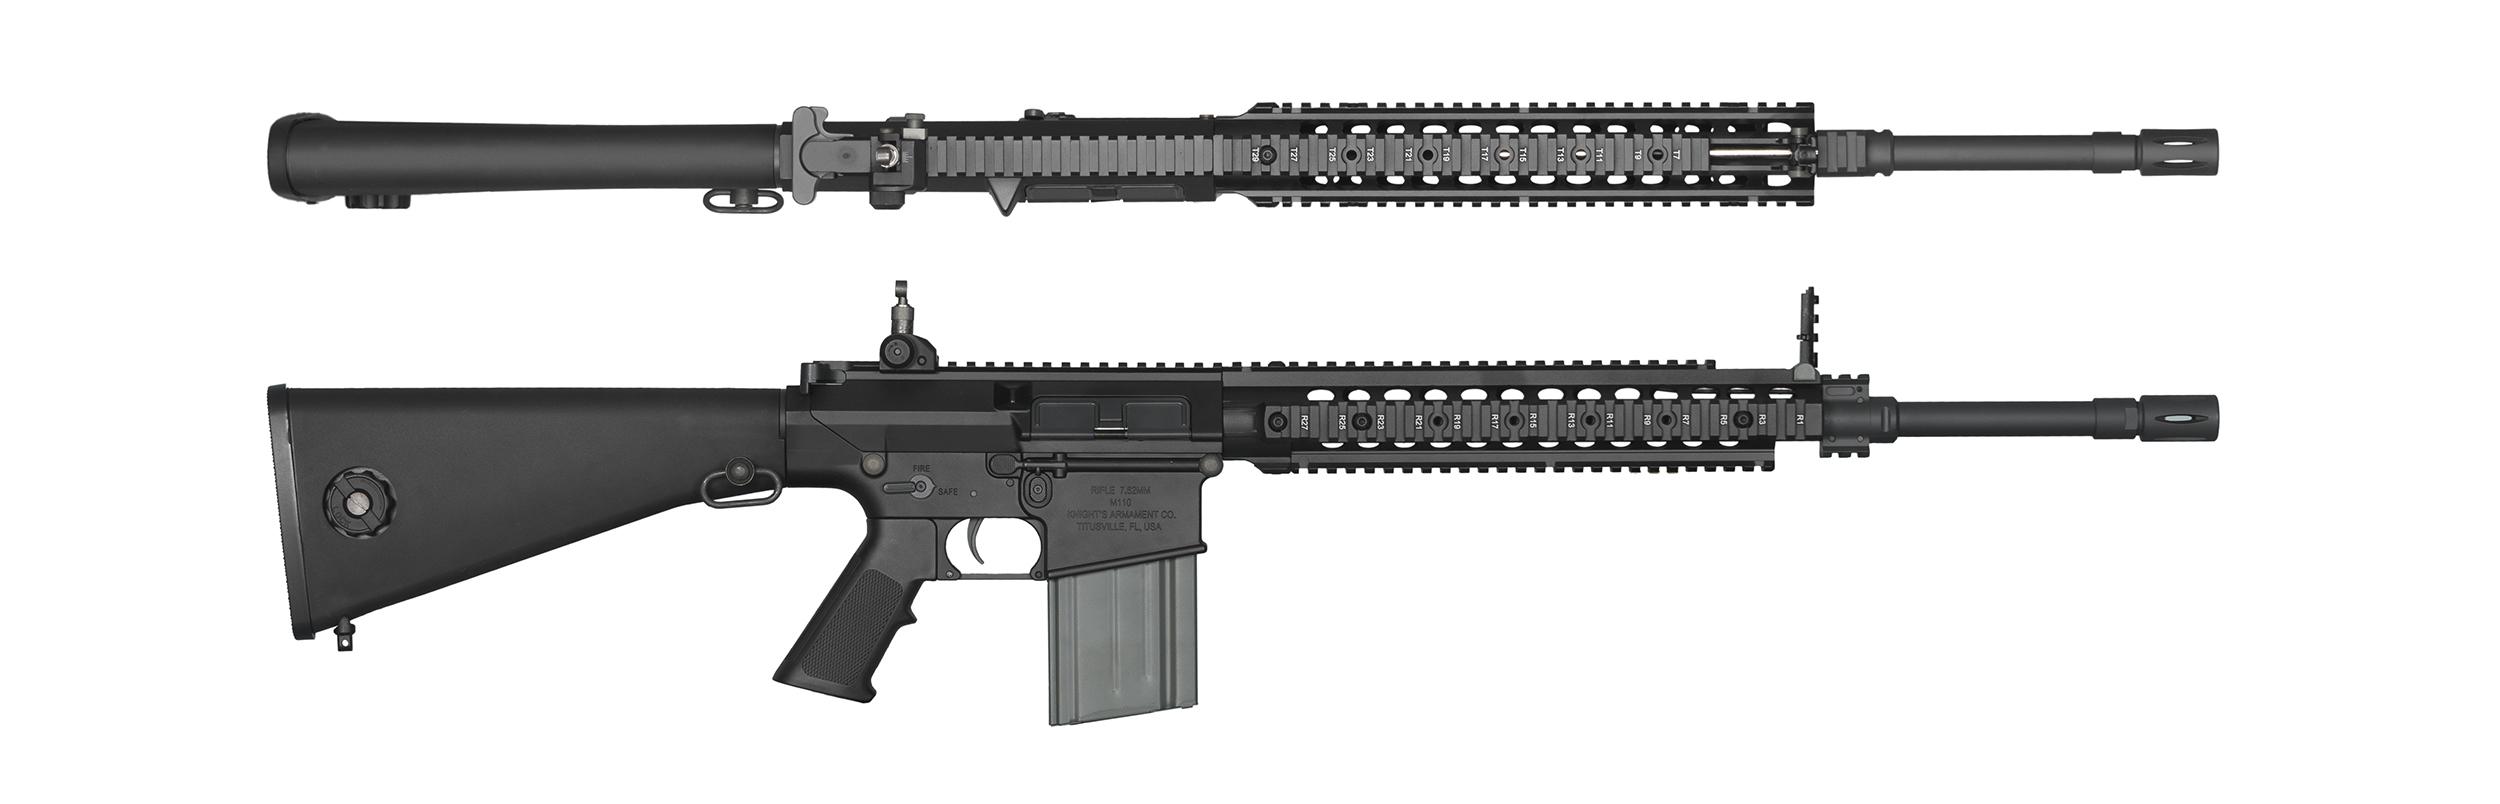 M110SASS-bk_long.jpg